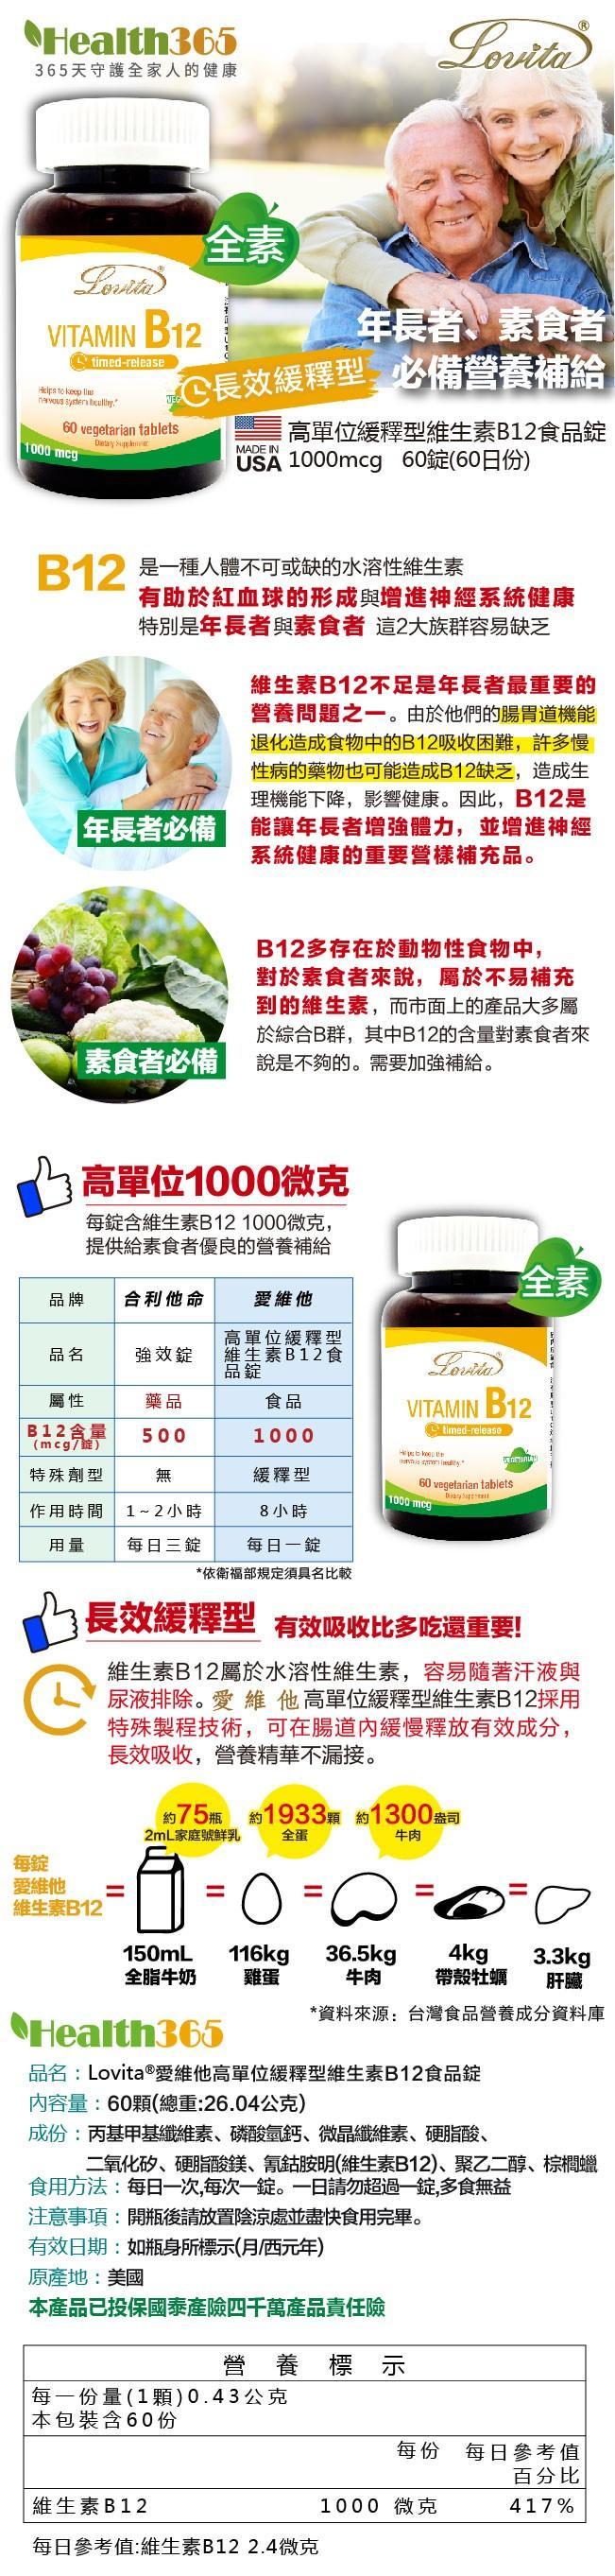 Lovita愛維他-高單位緩釋型維生素B12(1000mcg)(60錠-60天份)產品資訊